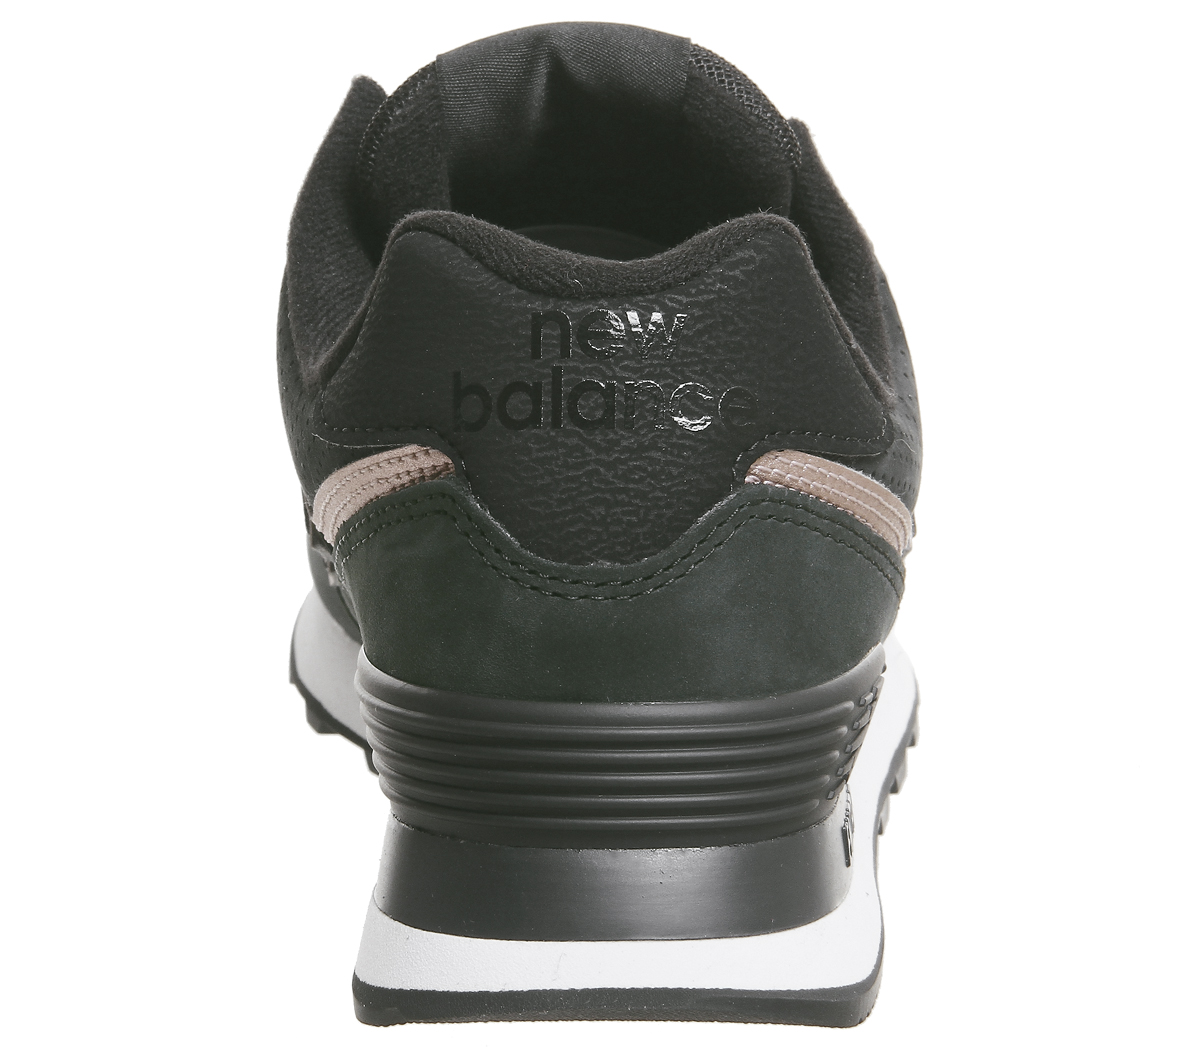 Rosa Zapatillas Balance Mujer Blanco Oro 574 Negro Y New tq4TxwzTZg